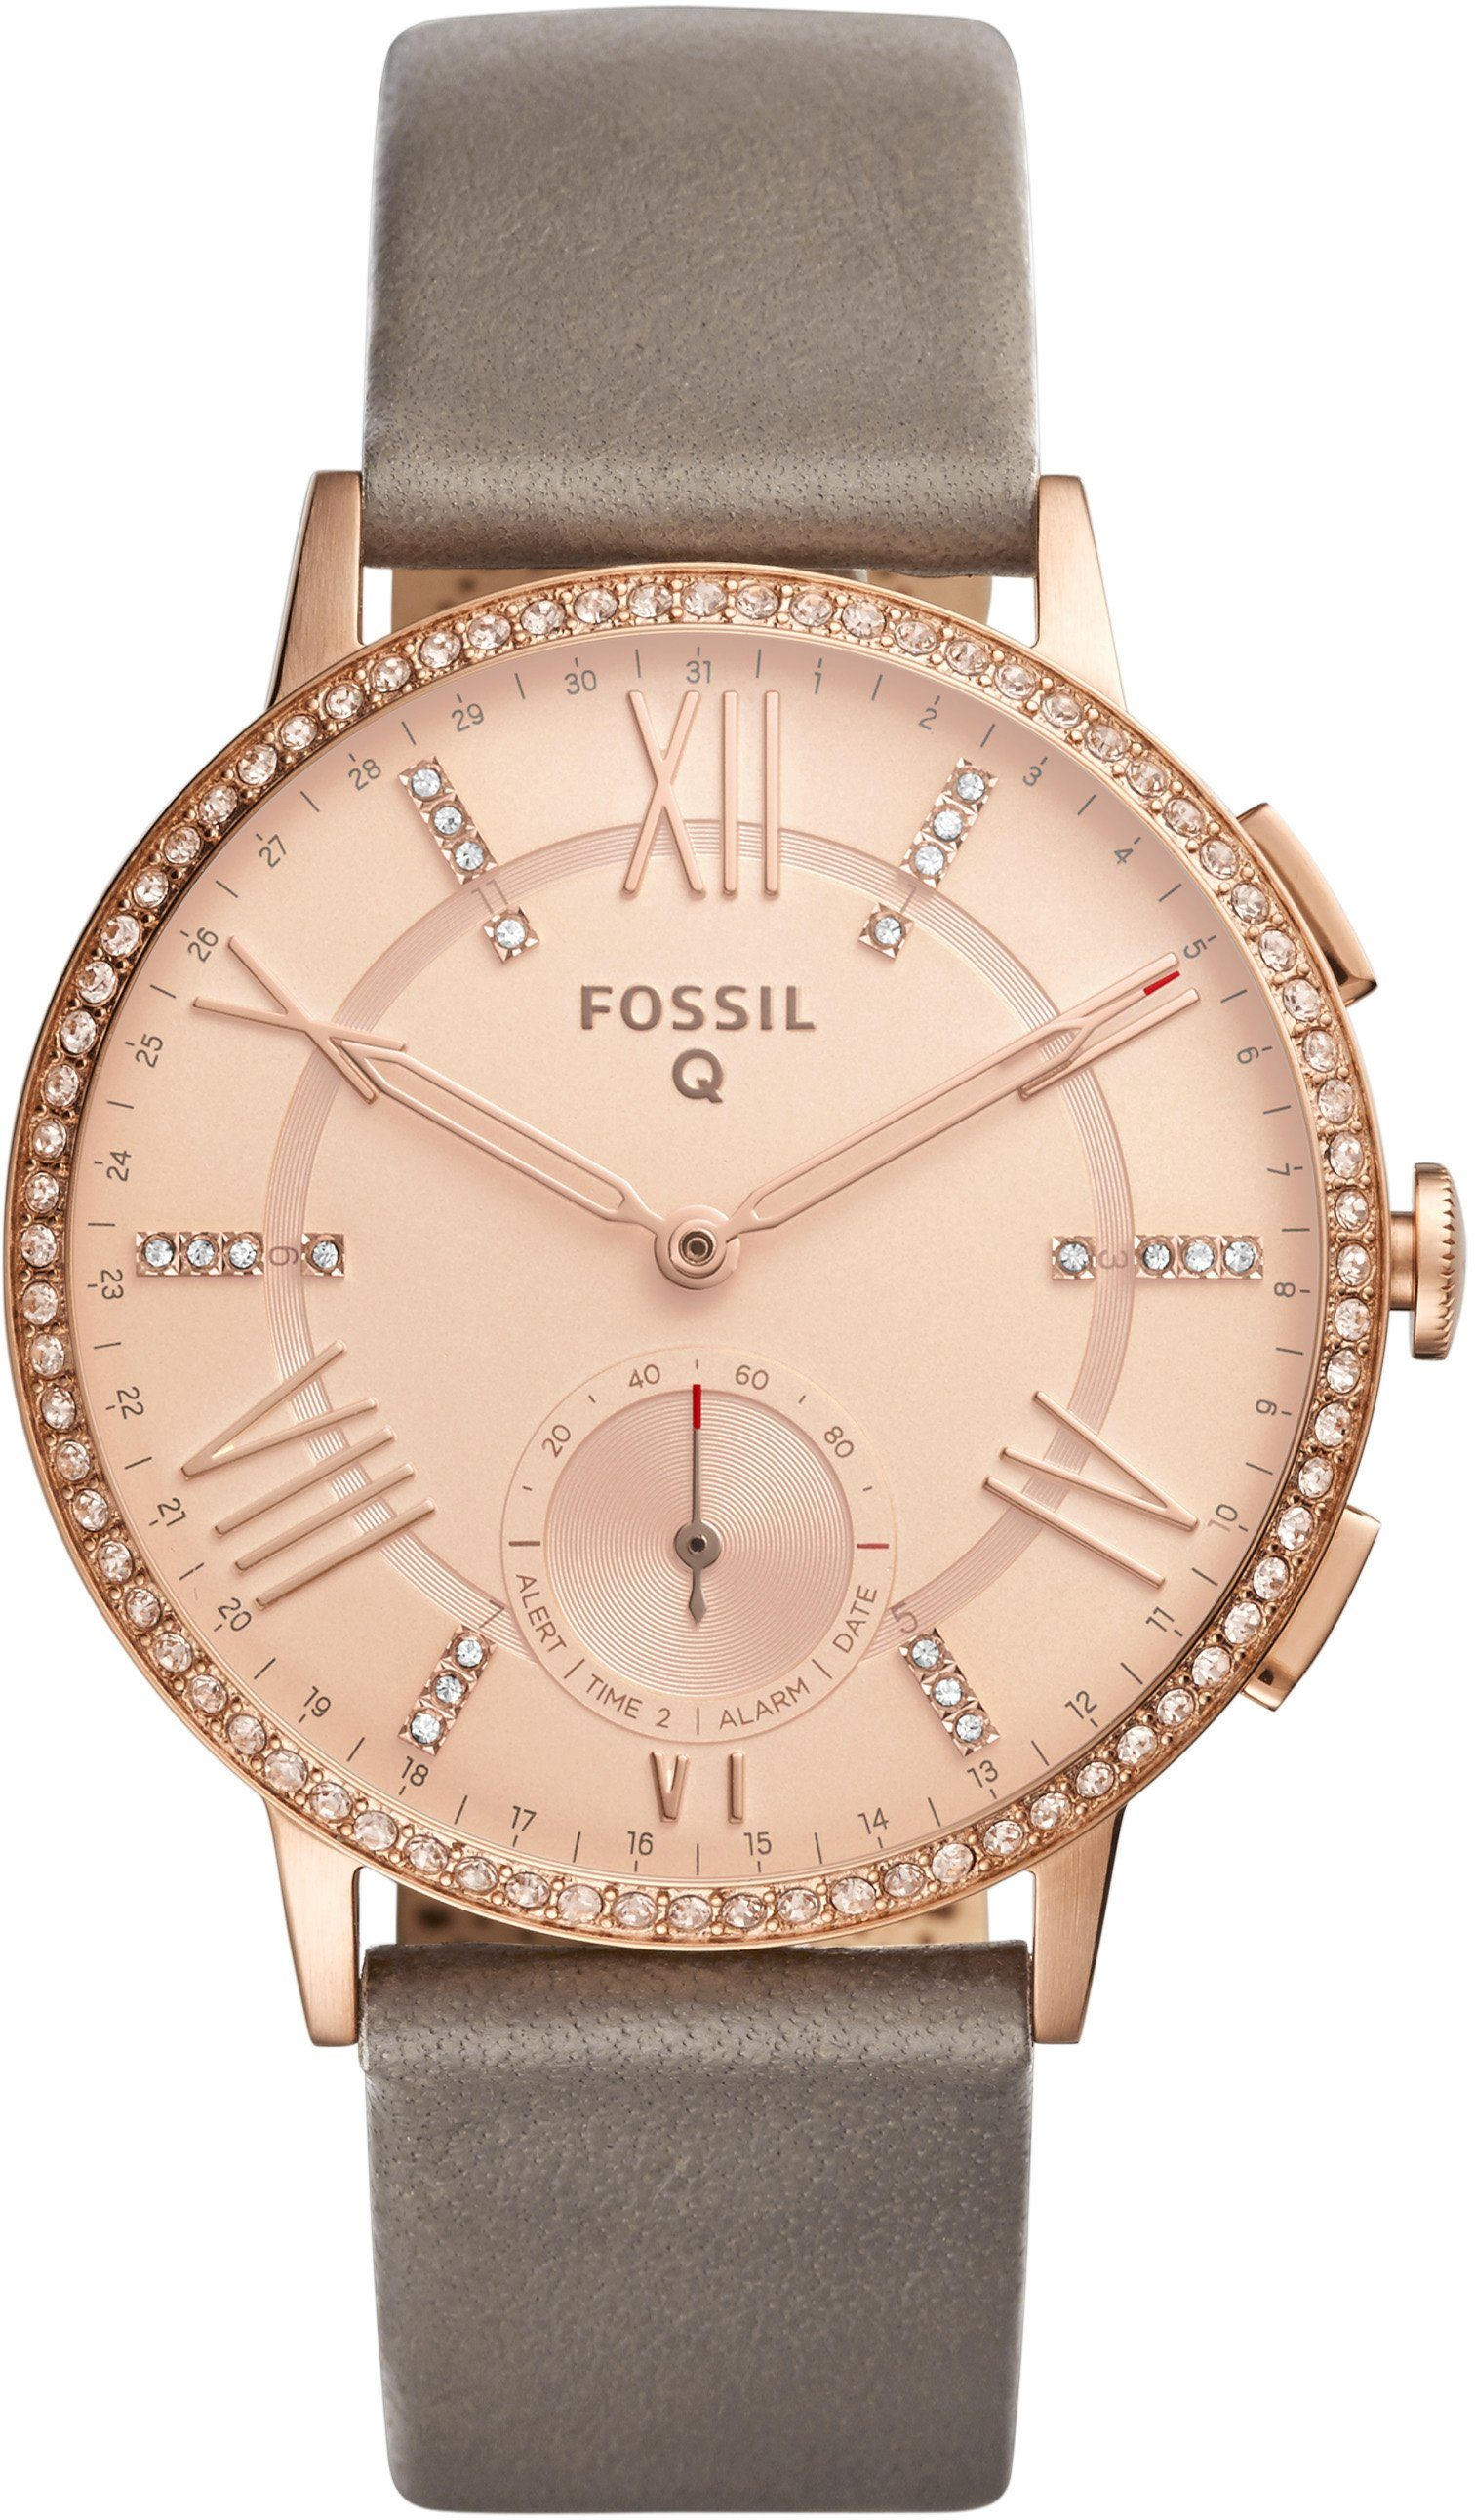 FOSSIL Q Q GAZER, FTW1116 Smartwatch (Android Wear)